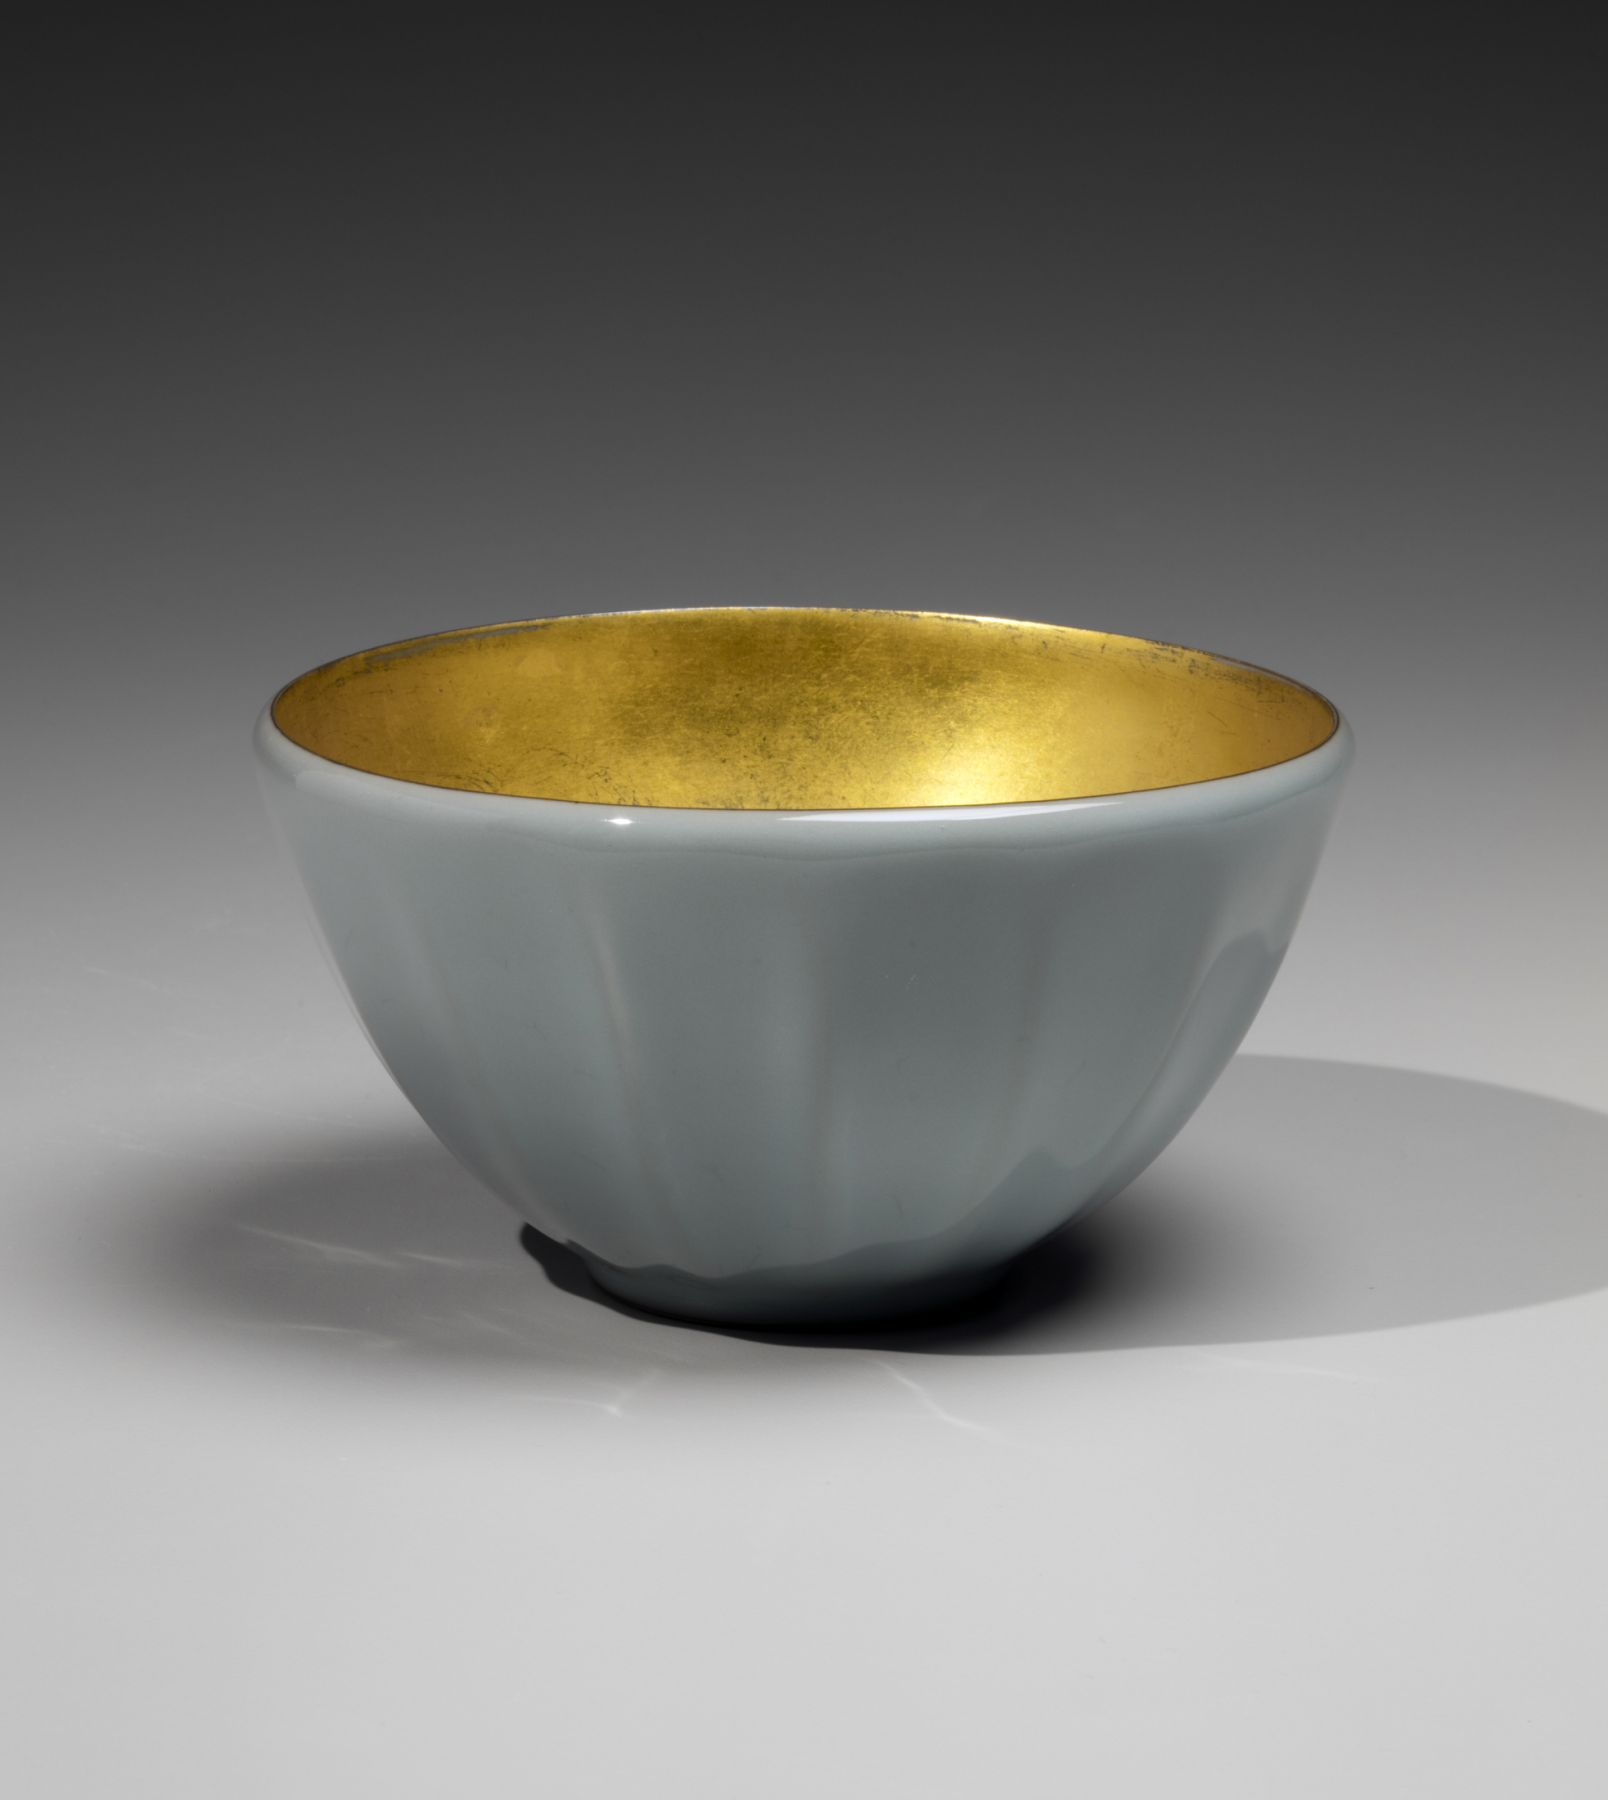 Kawase Shinobu (b. 1950), Fluted celadon teabowl with gold-leaf interior